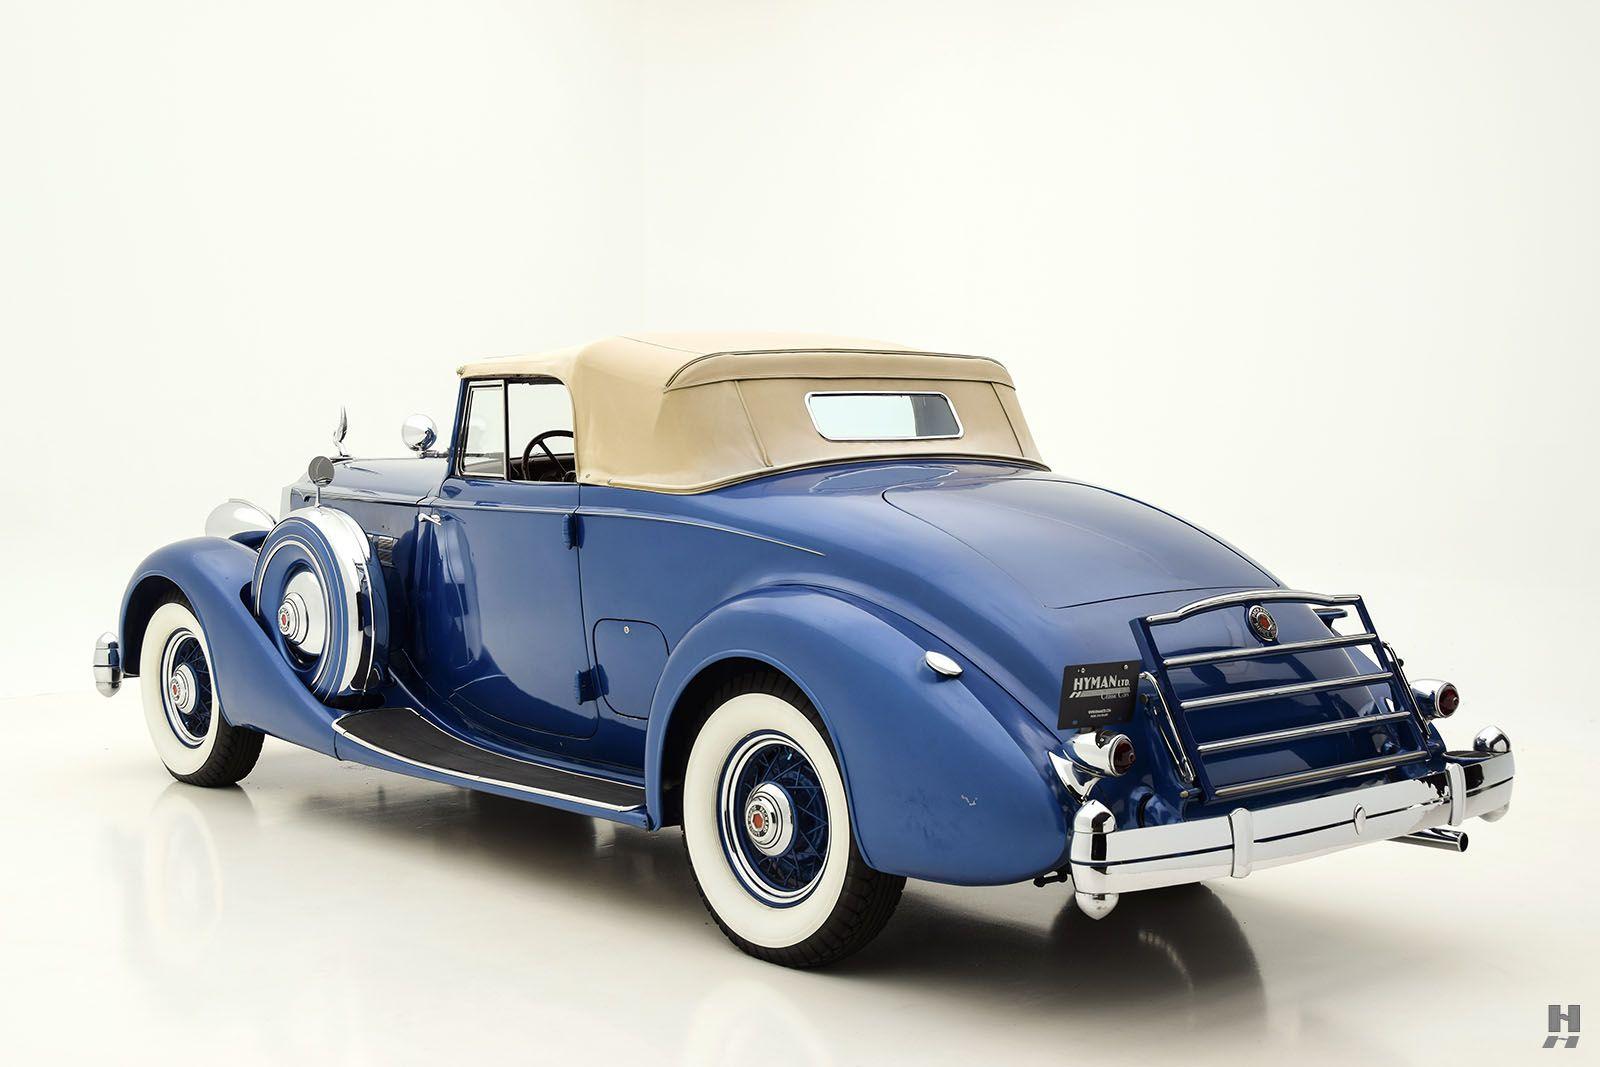 1947 MG TC Roadster Classic Car For Sale | Buy 1947 MG TC Roadster ...